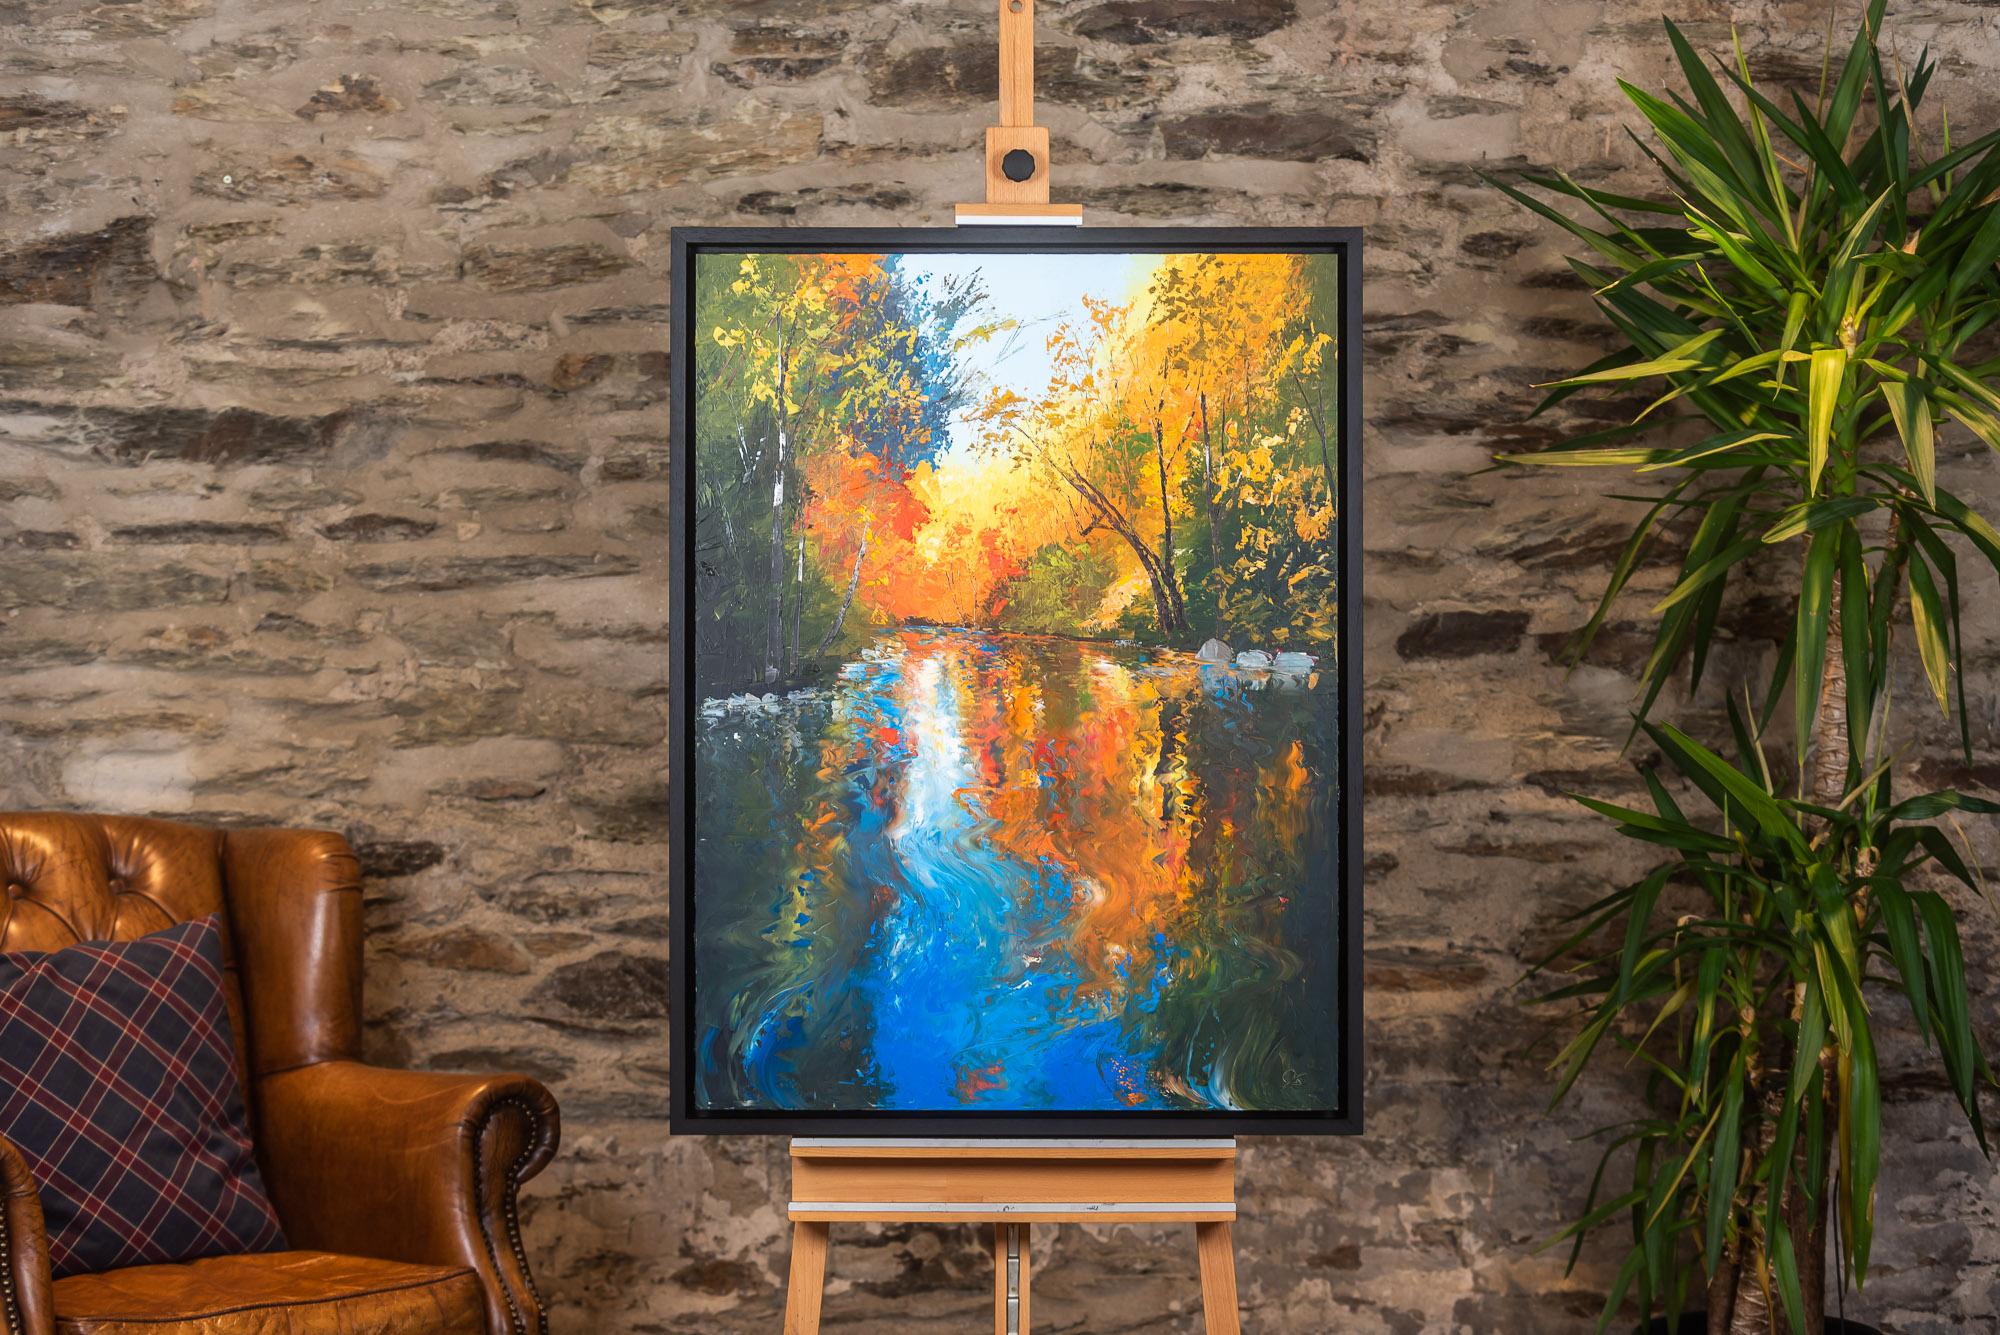 Autumn Awakens - Original Landscape painting from UK Artist Paul Kenton